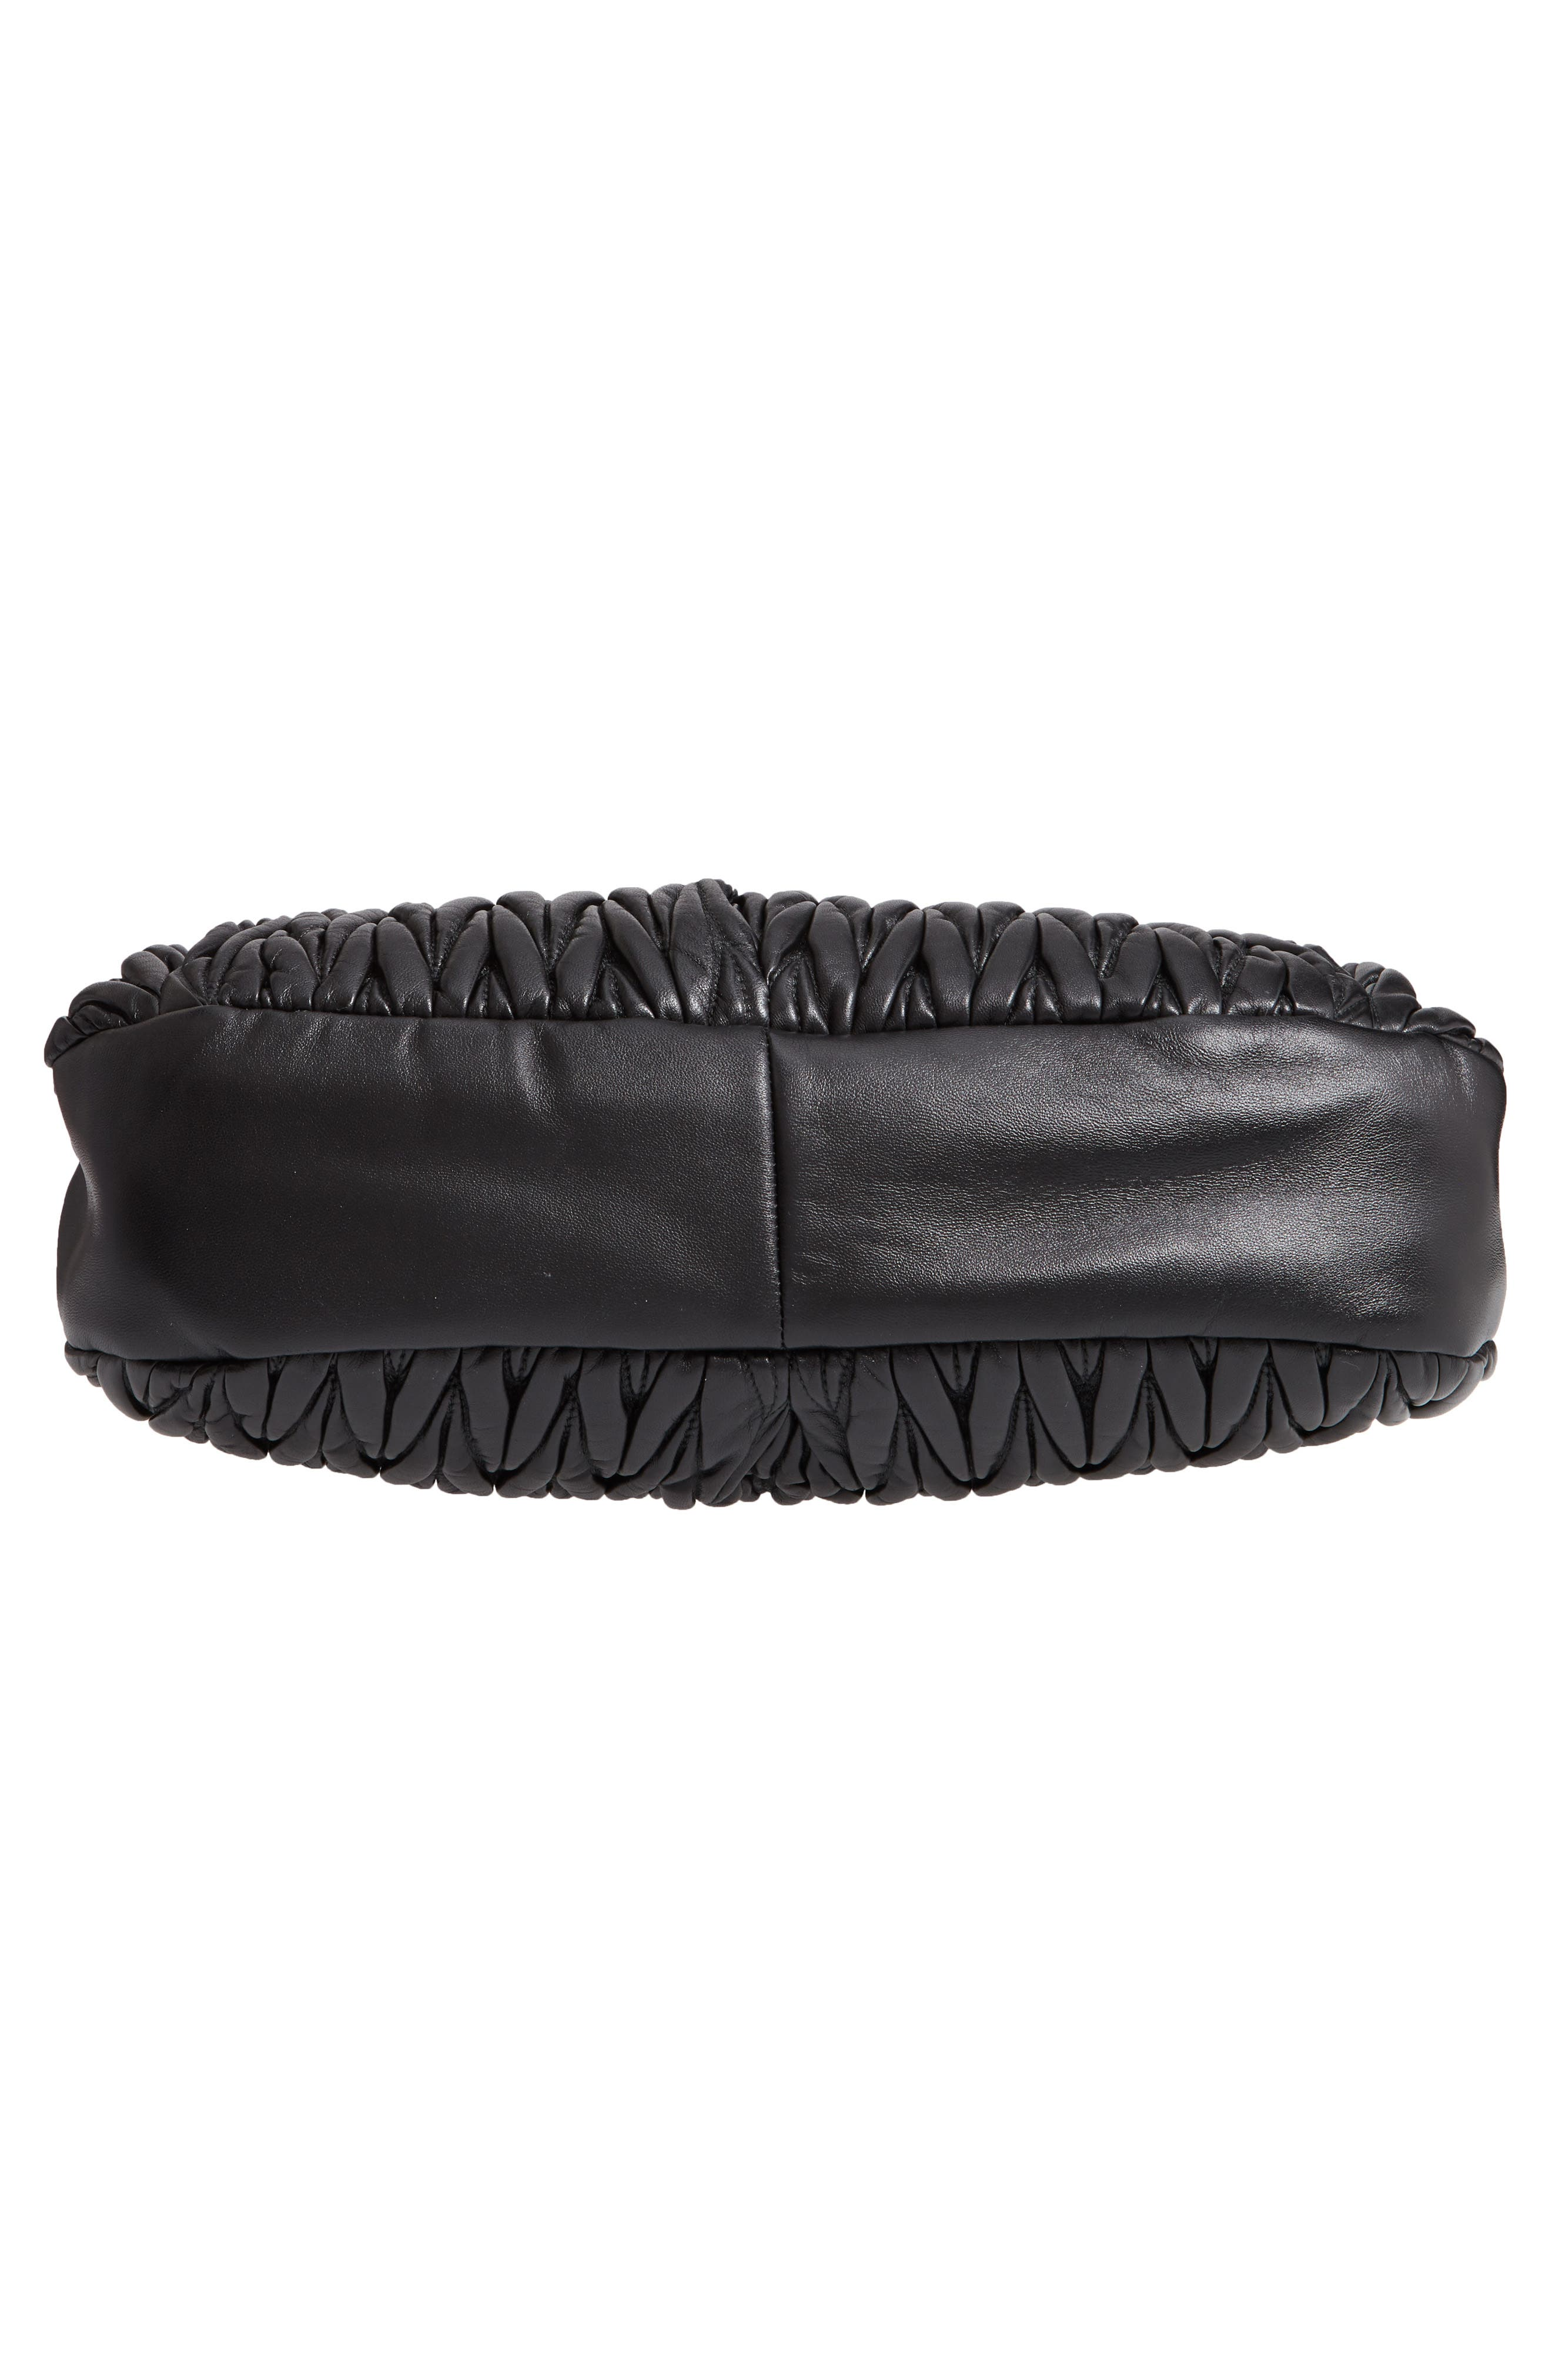 Matelassé Lambskin Leather Shoulder Bag,                             Alternate thumbnail 6, color,                             001